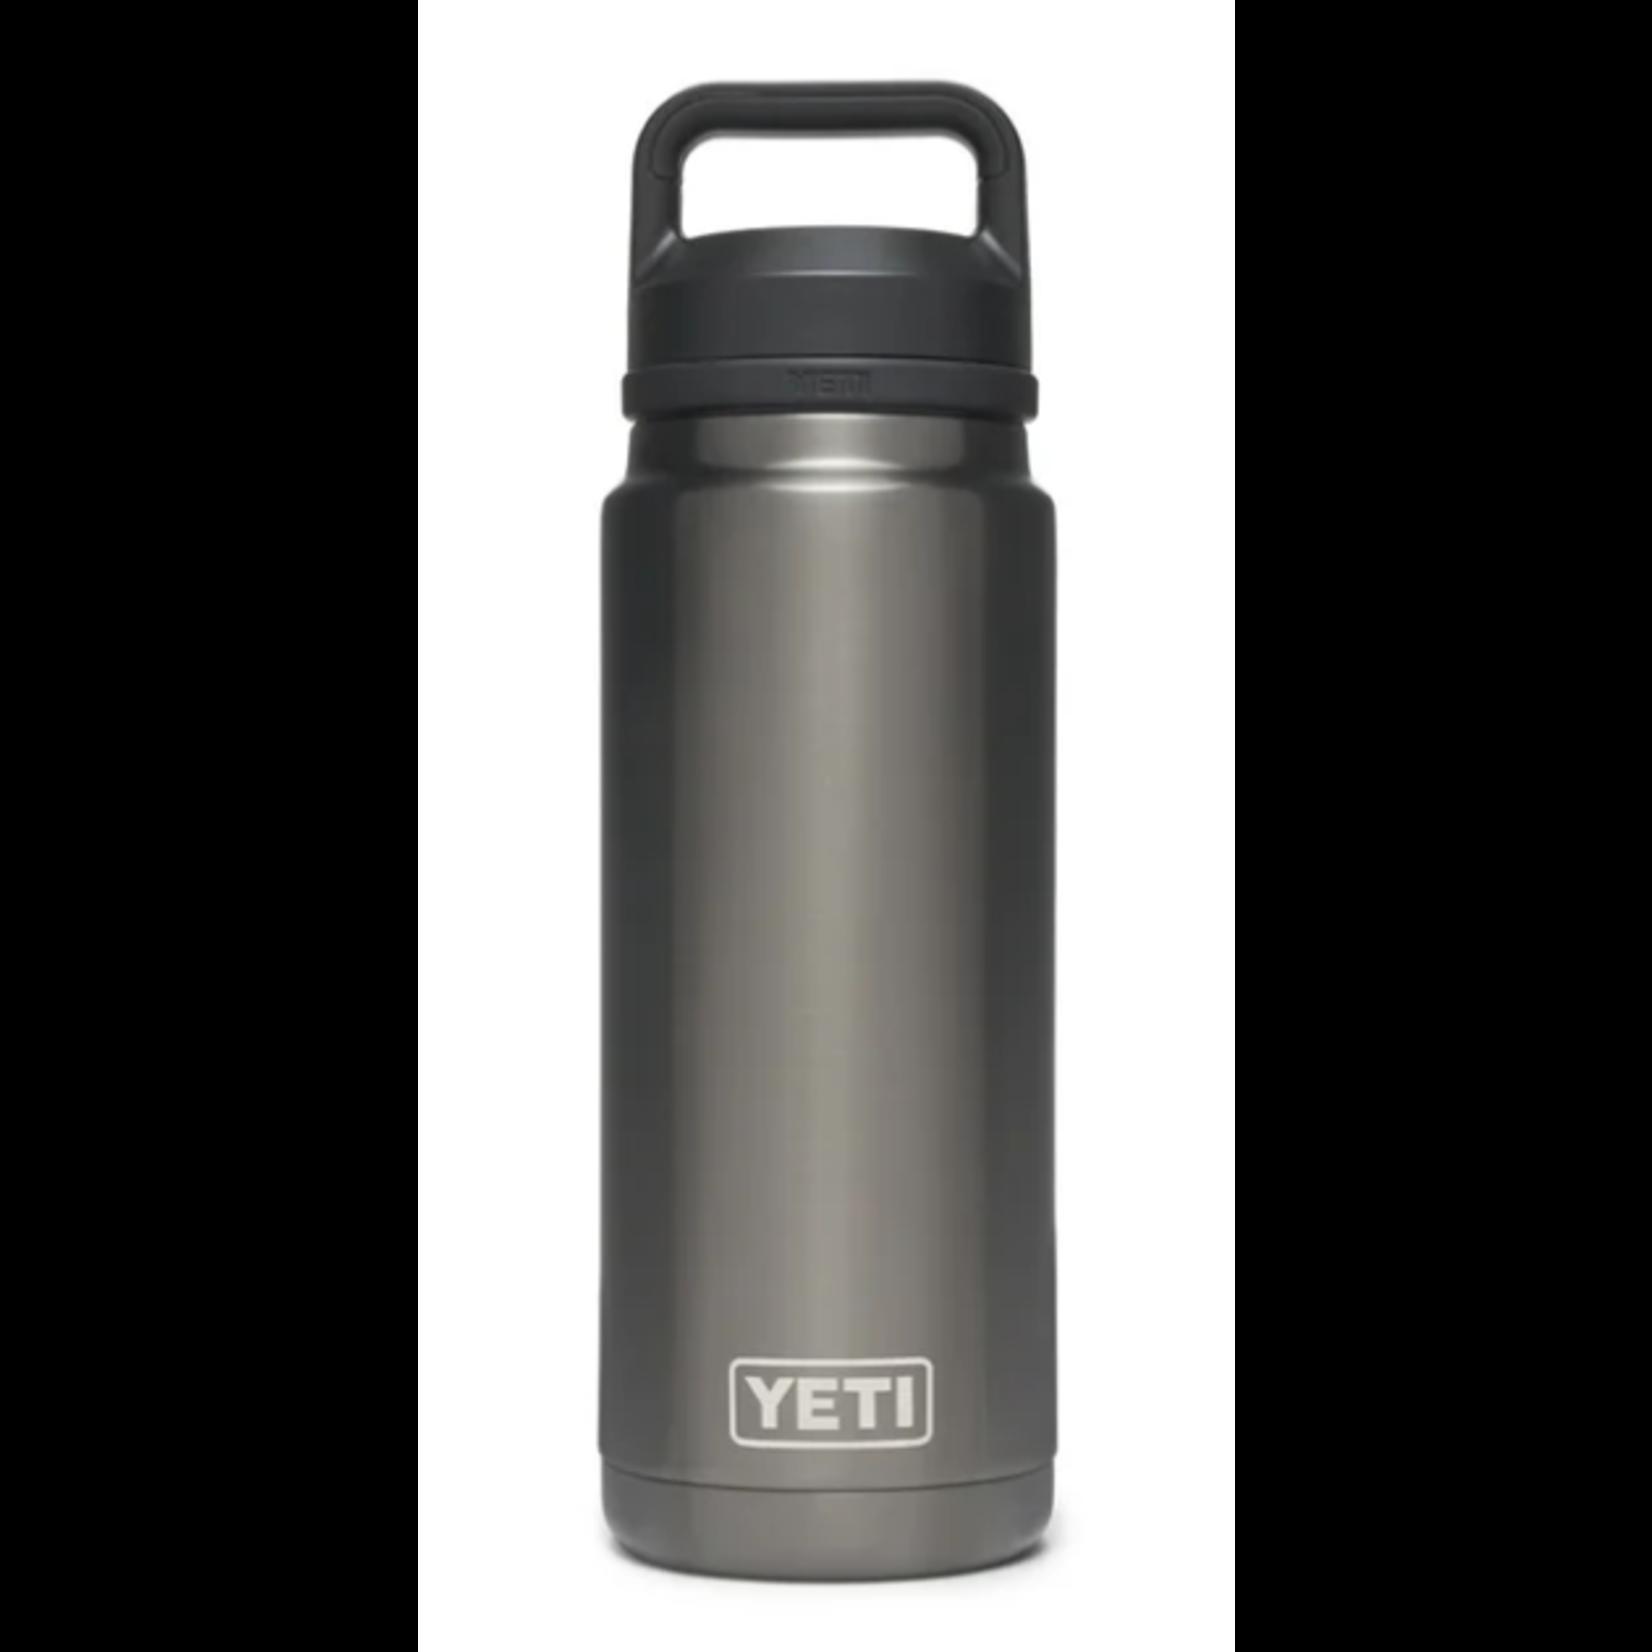 YETI ELEMENTS Rambler 26oz Bottle w/ Chug Cap